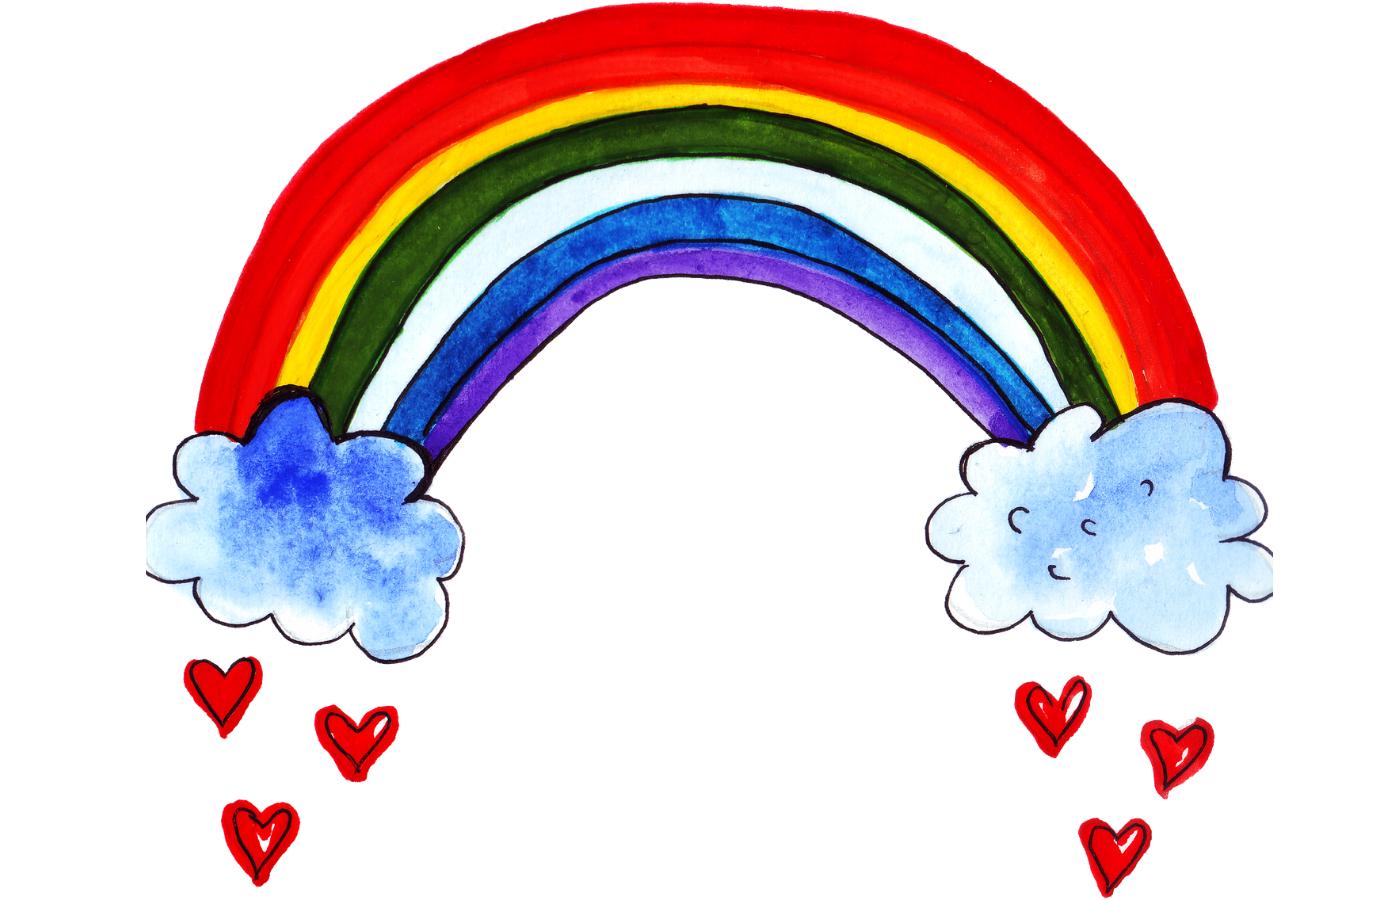 Hand drawn rainbow image with hearts